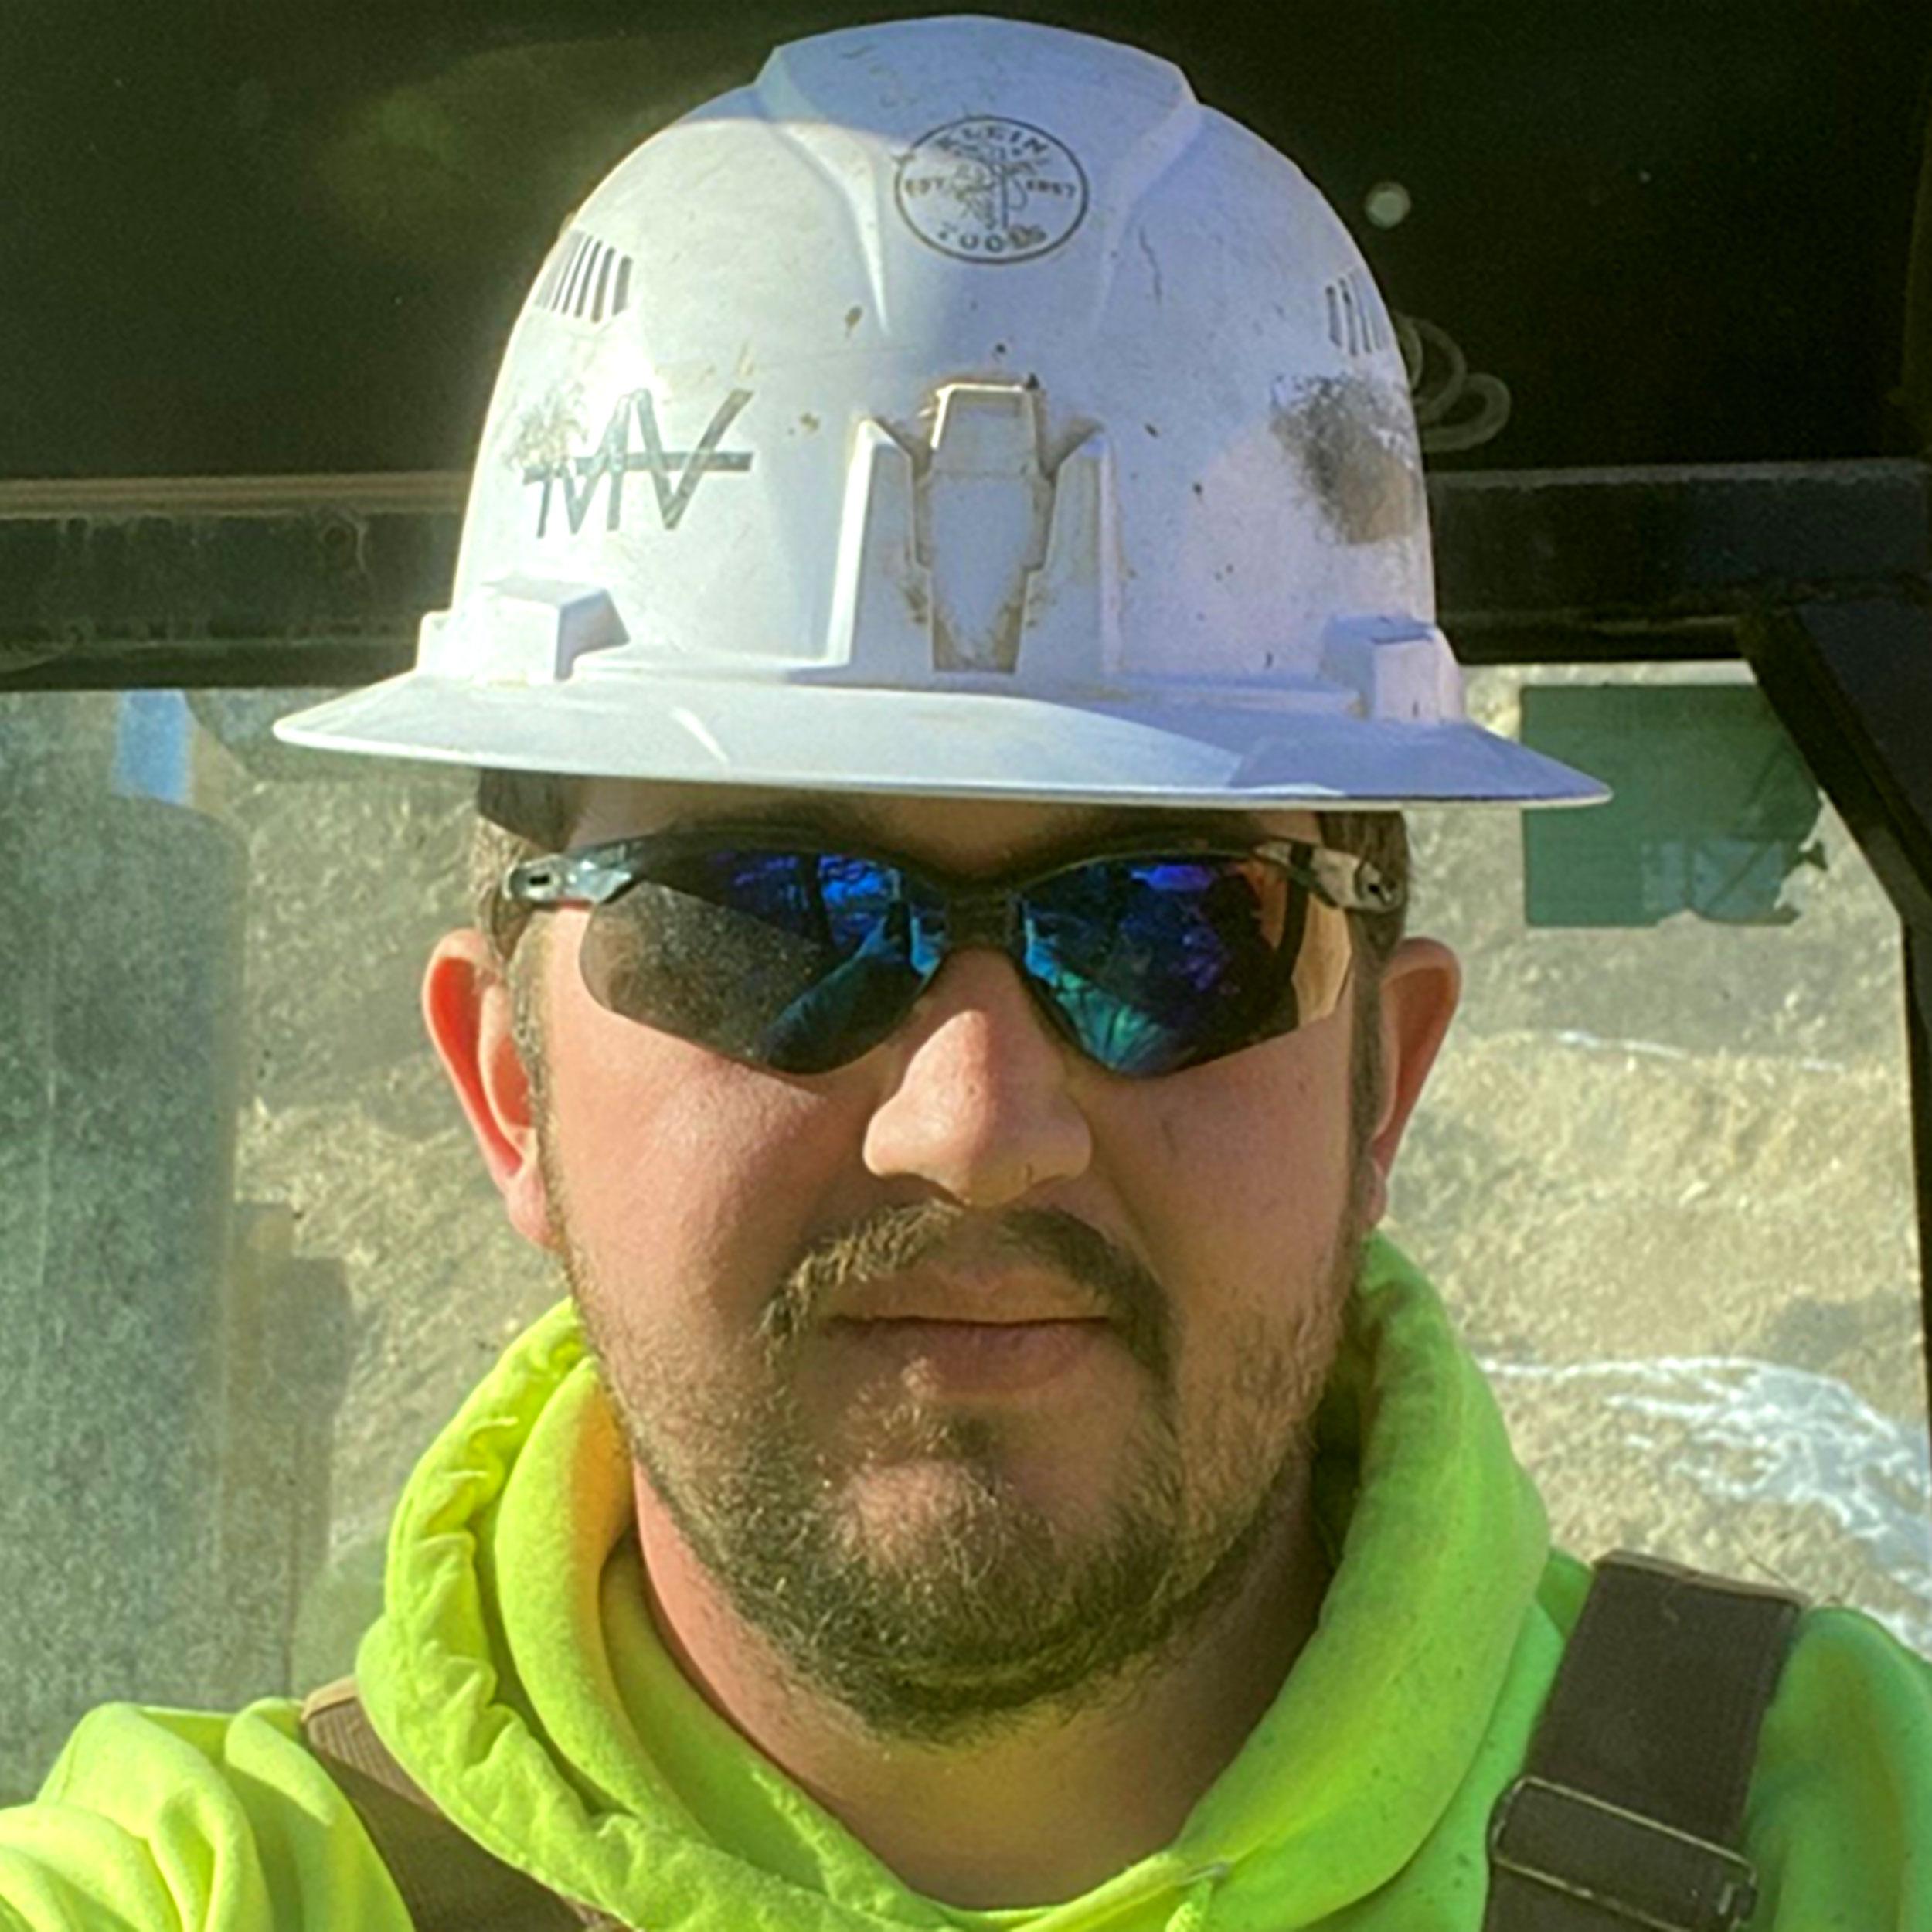 photo os Jevon Sturgeon the equipment operator